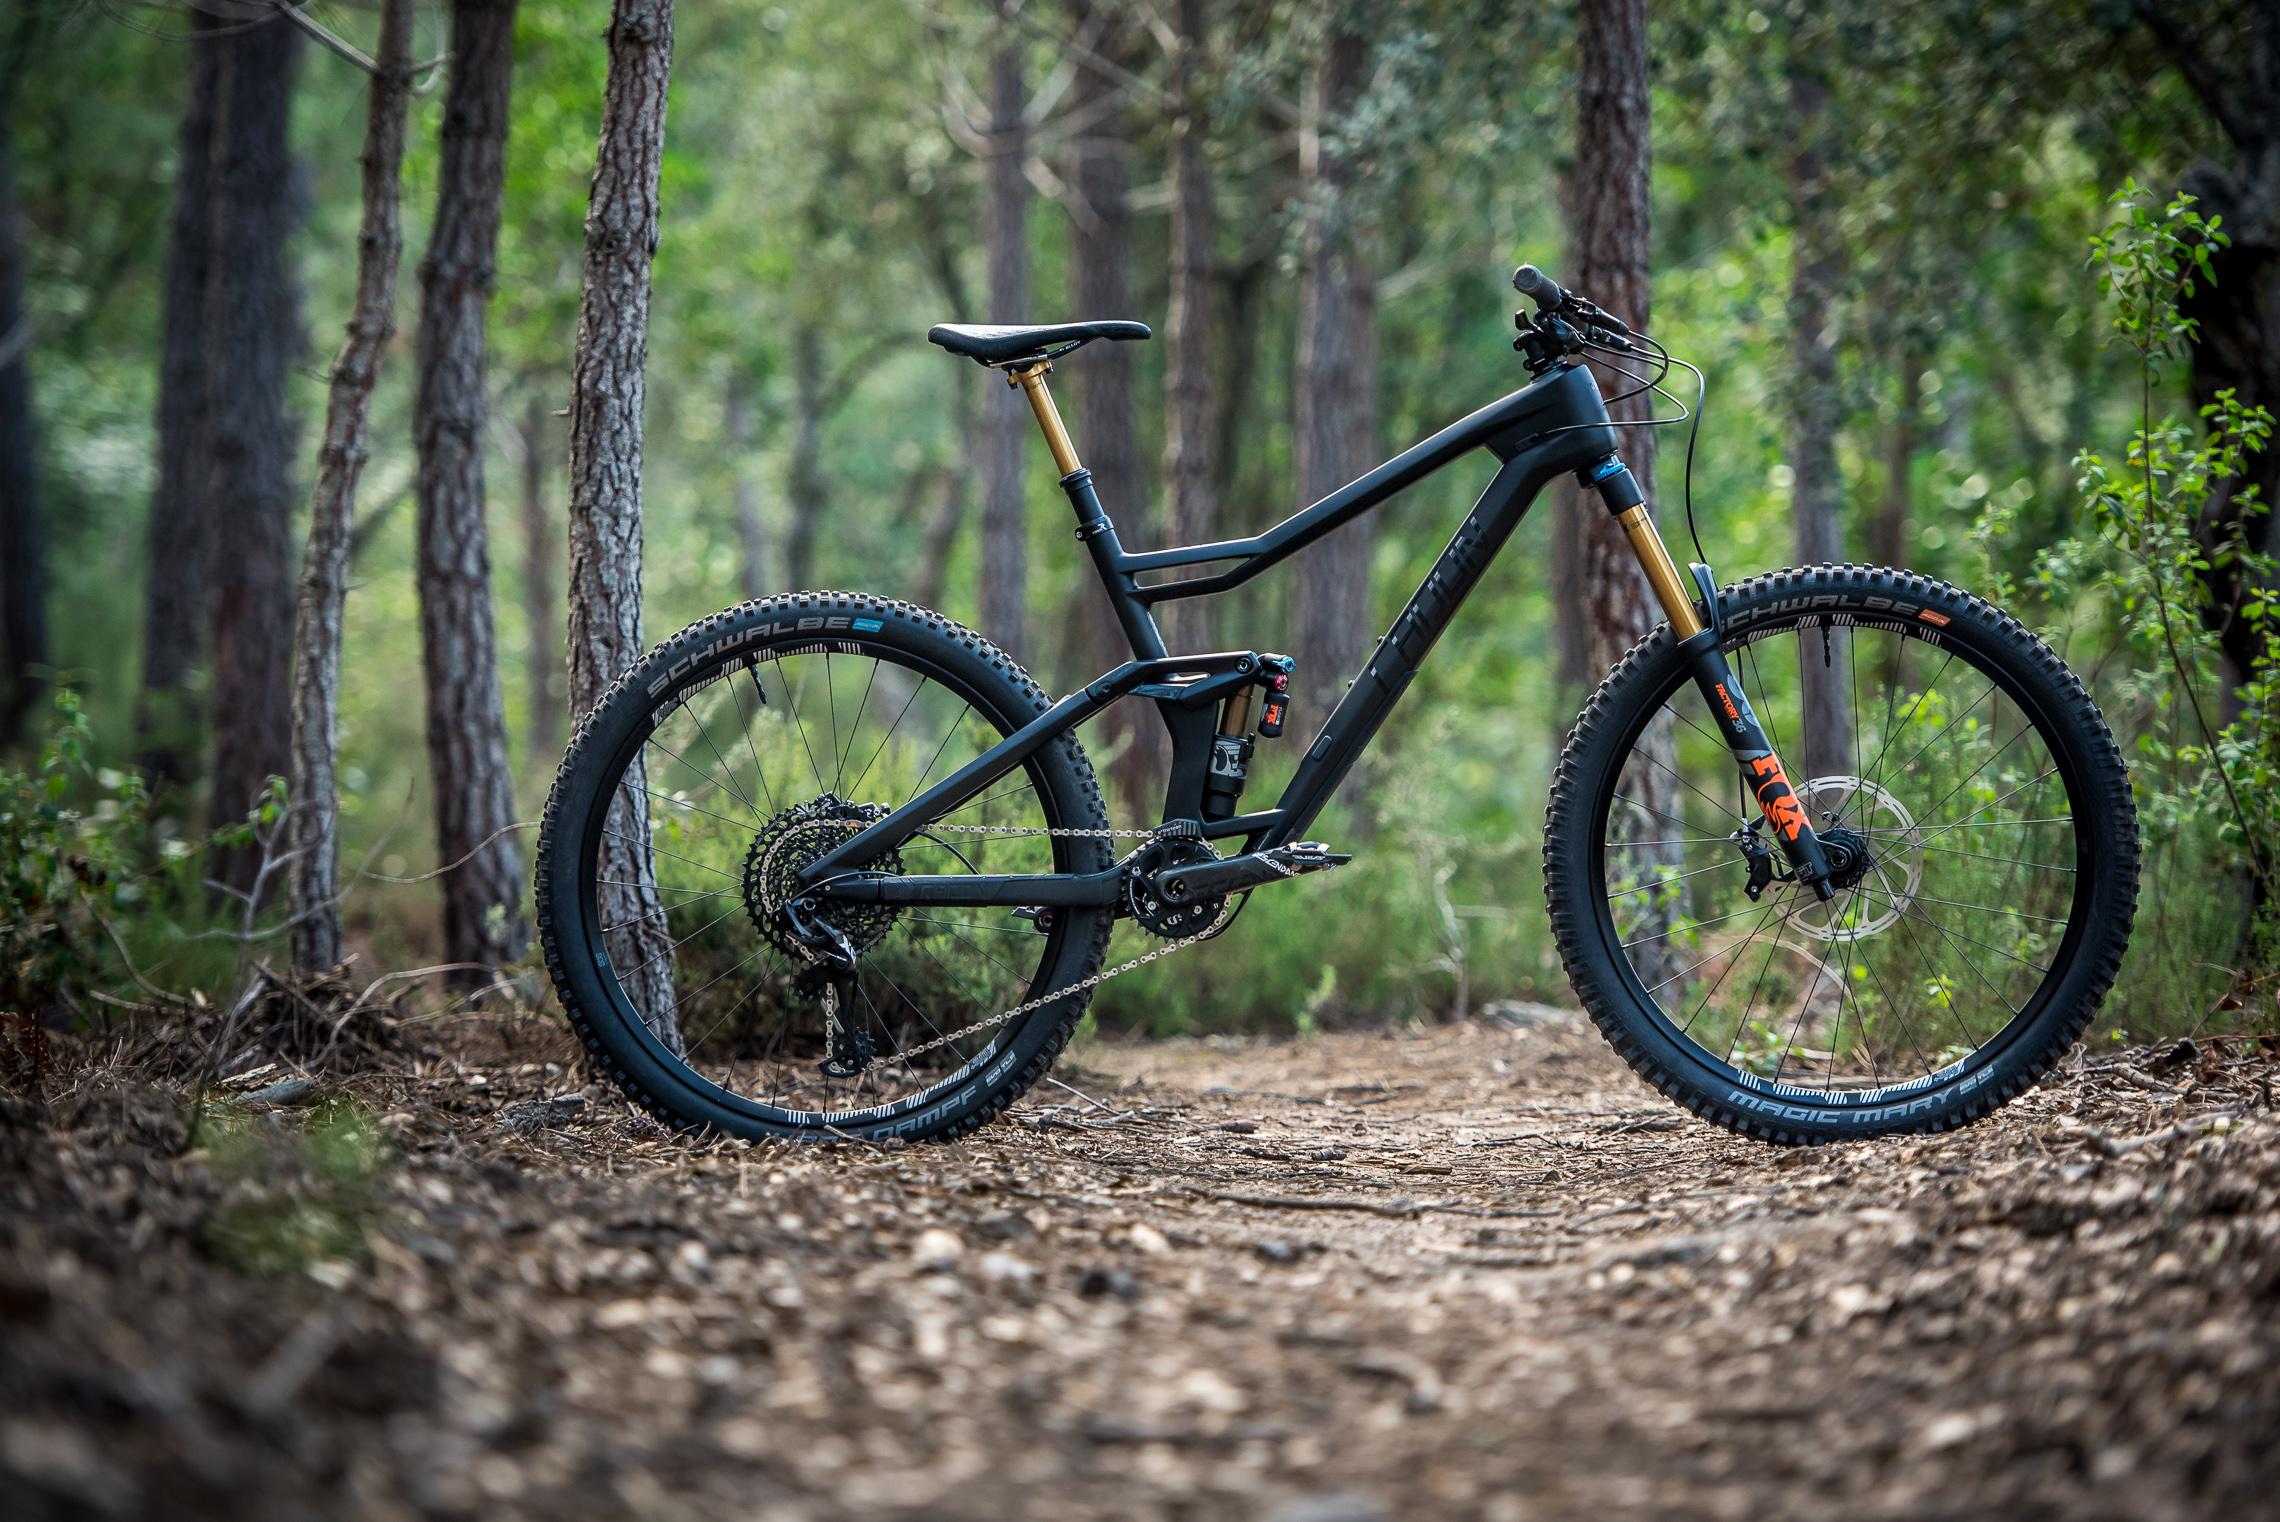 Radon Jab 10.0 im Test: Kantiges Enduro Bike im Stealth Look